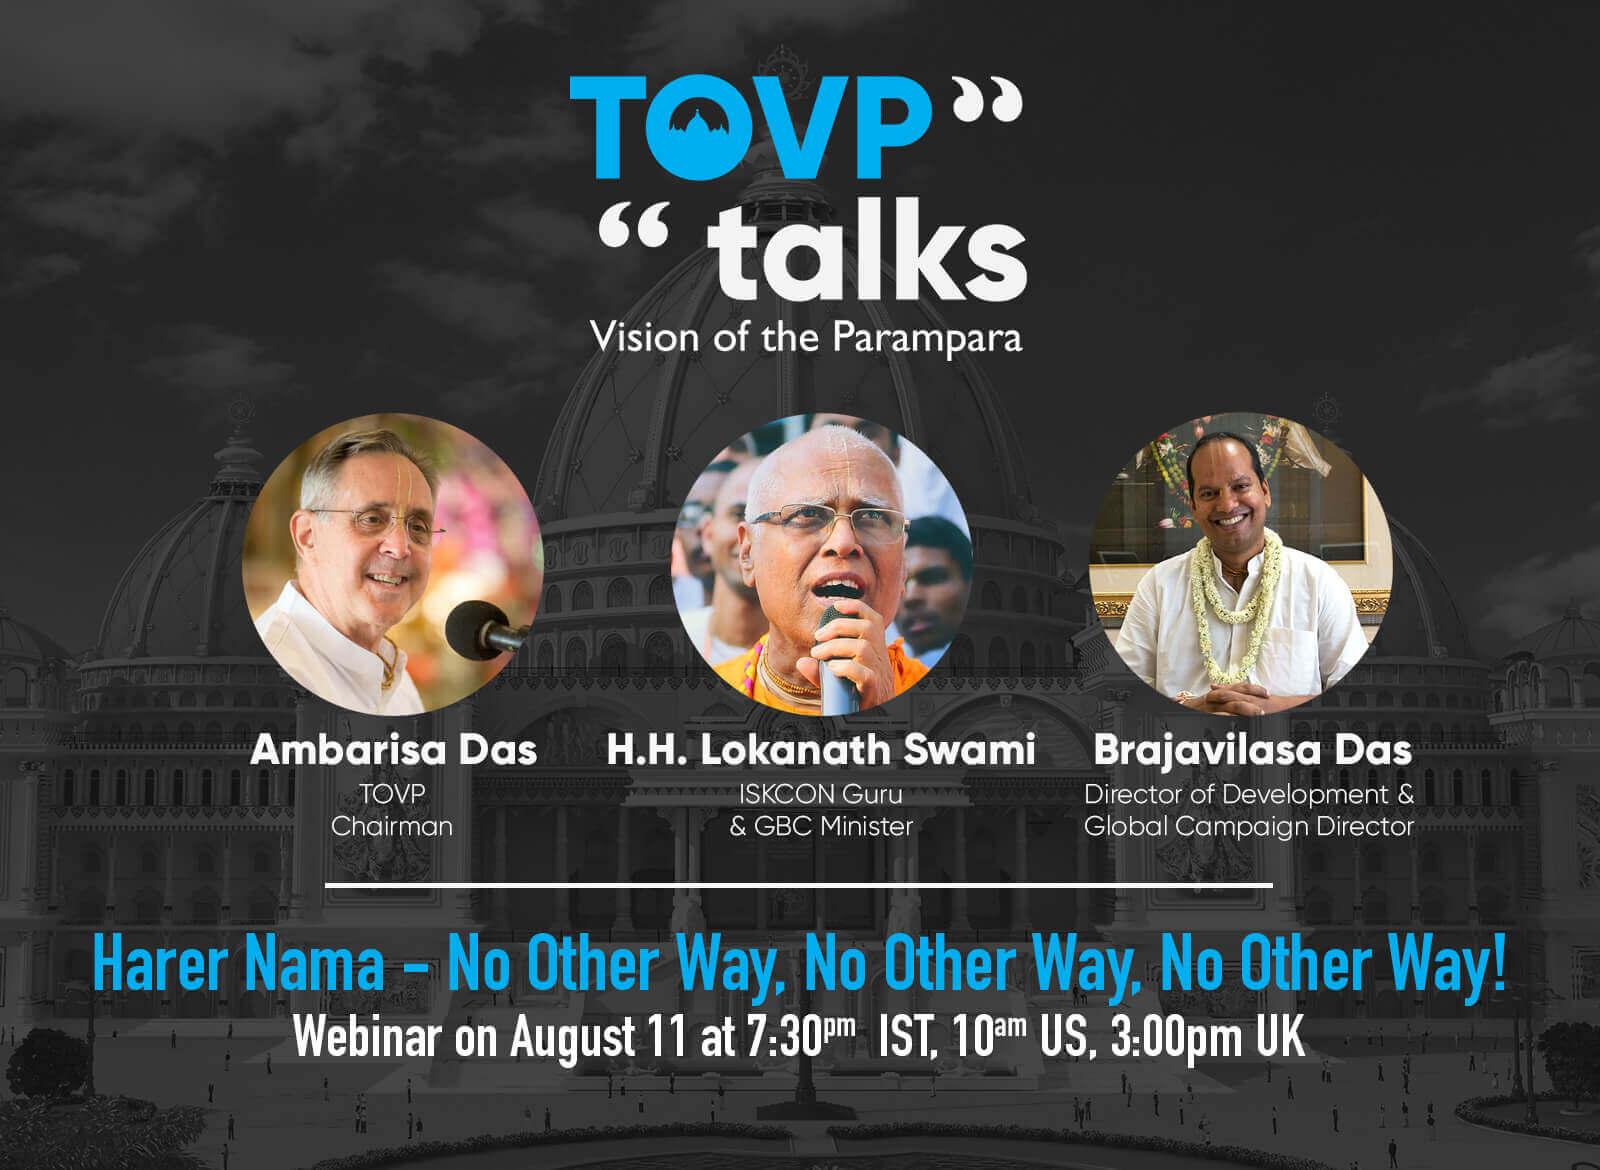 TOVP Talks Webinar - H.H. Lokanath Swami, August 11, 2020